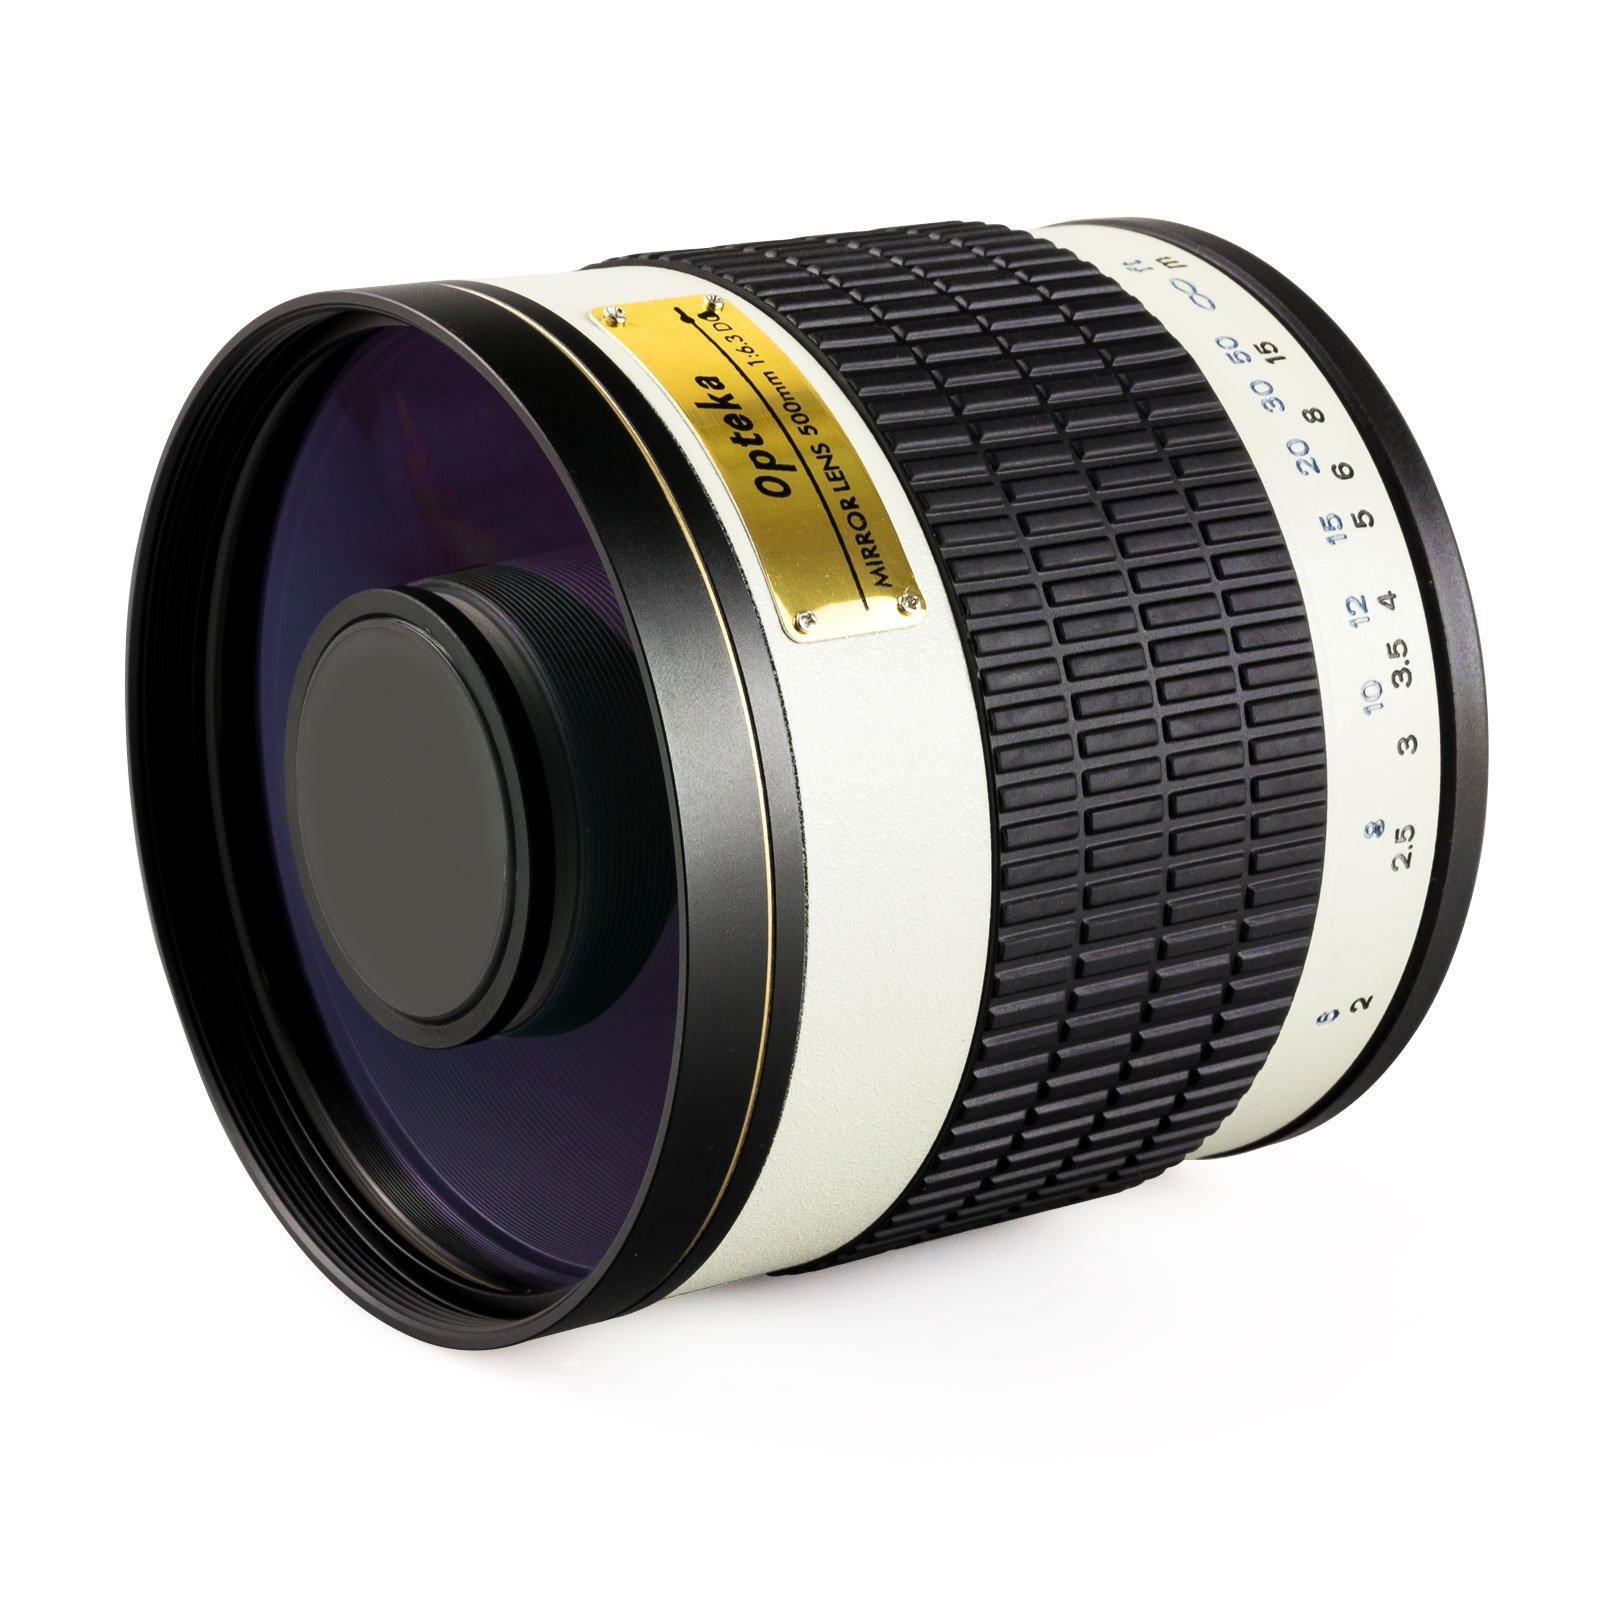 Opteka 500mm f/6.3 HD Telephoto Mirror Lens for Panasonic Lumix DMC G9, GH5, GX850, G85, GX8, G7, GM5, GH4, GX7, GH3, GH1, Olympus PEN E-PL7, P5, PL5, PM2, PL1, PL2 Micro Four Thirds Digital Cameras